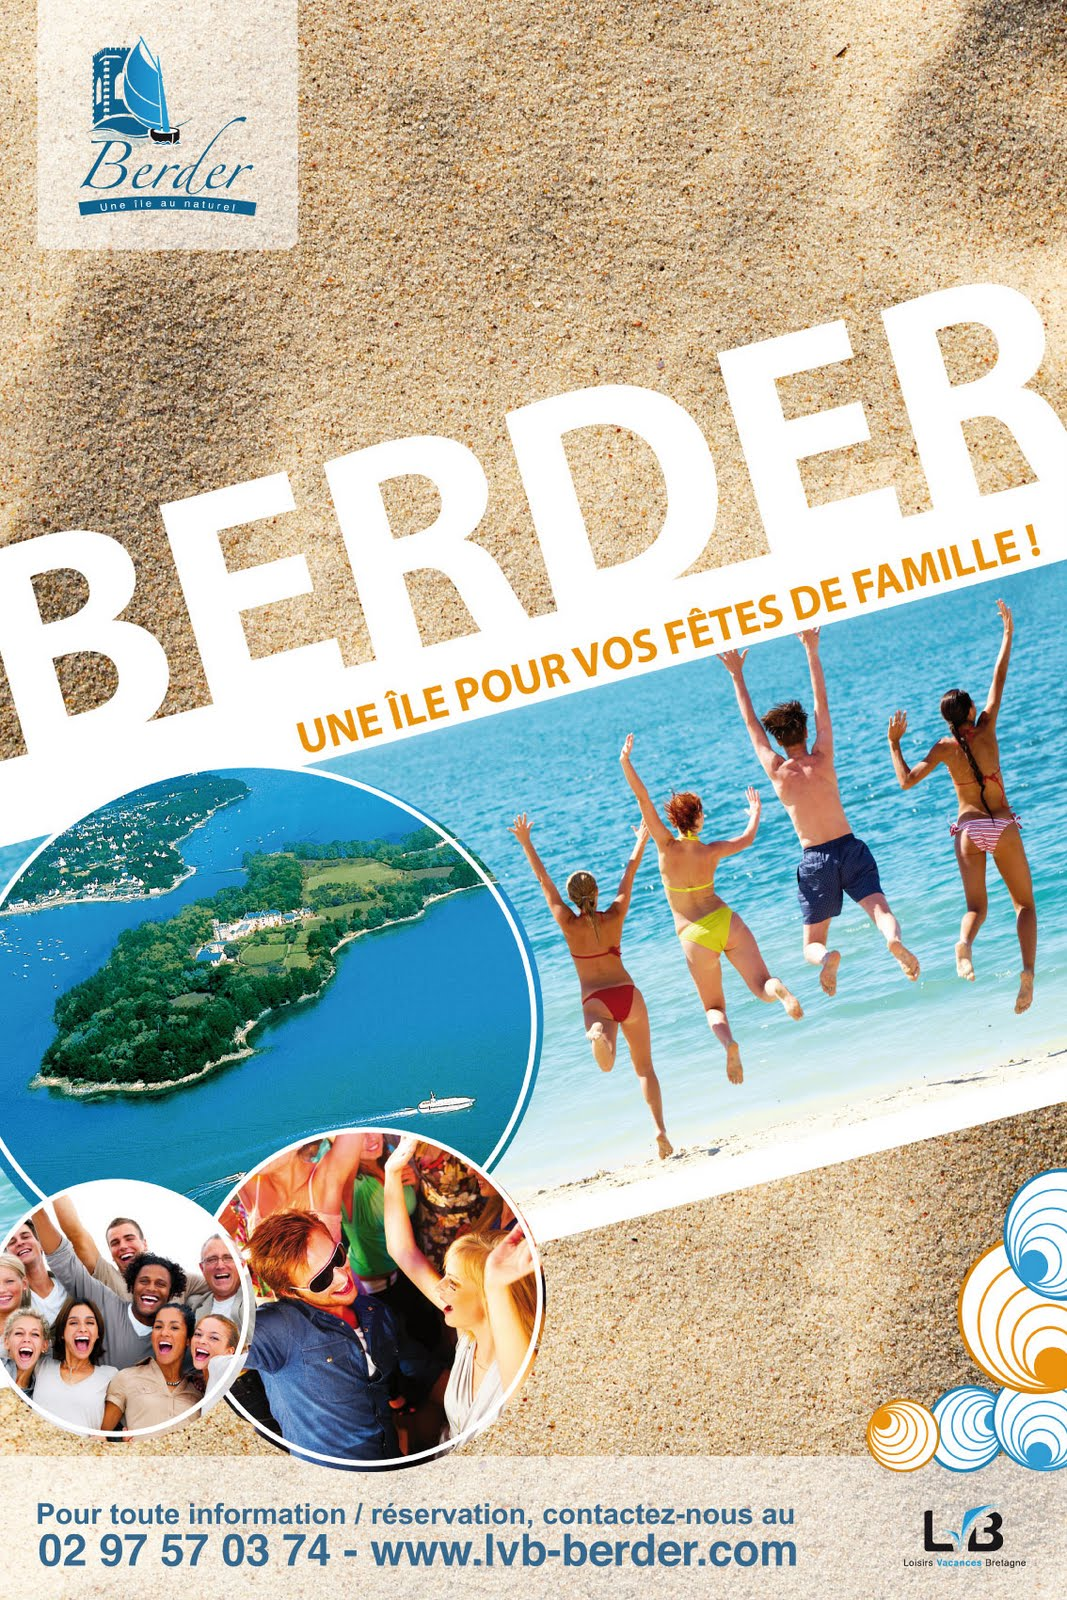 ode u0026 39 graphik  lvb  loisir tourisme bretagne